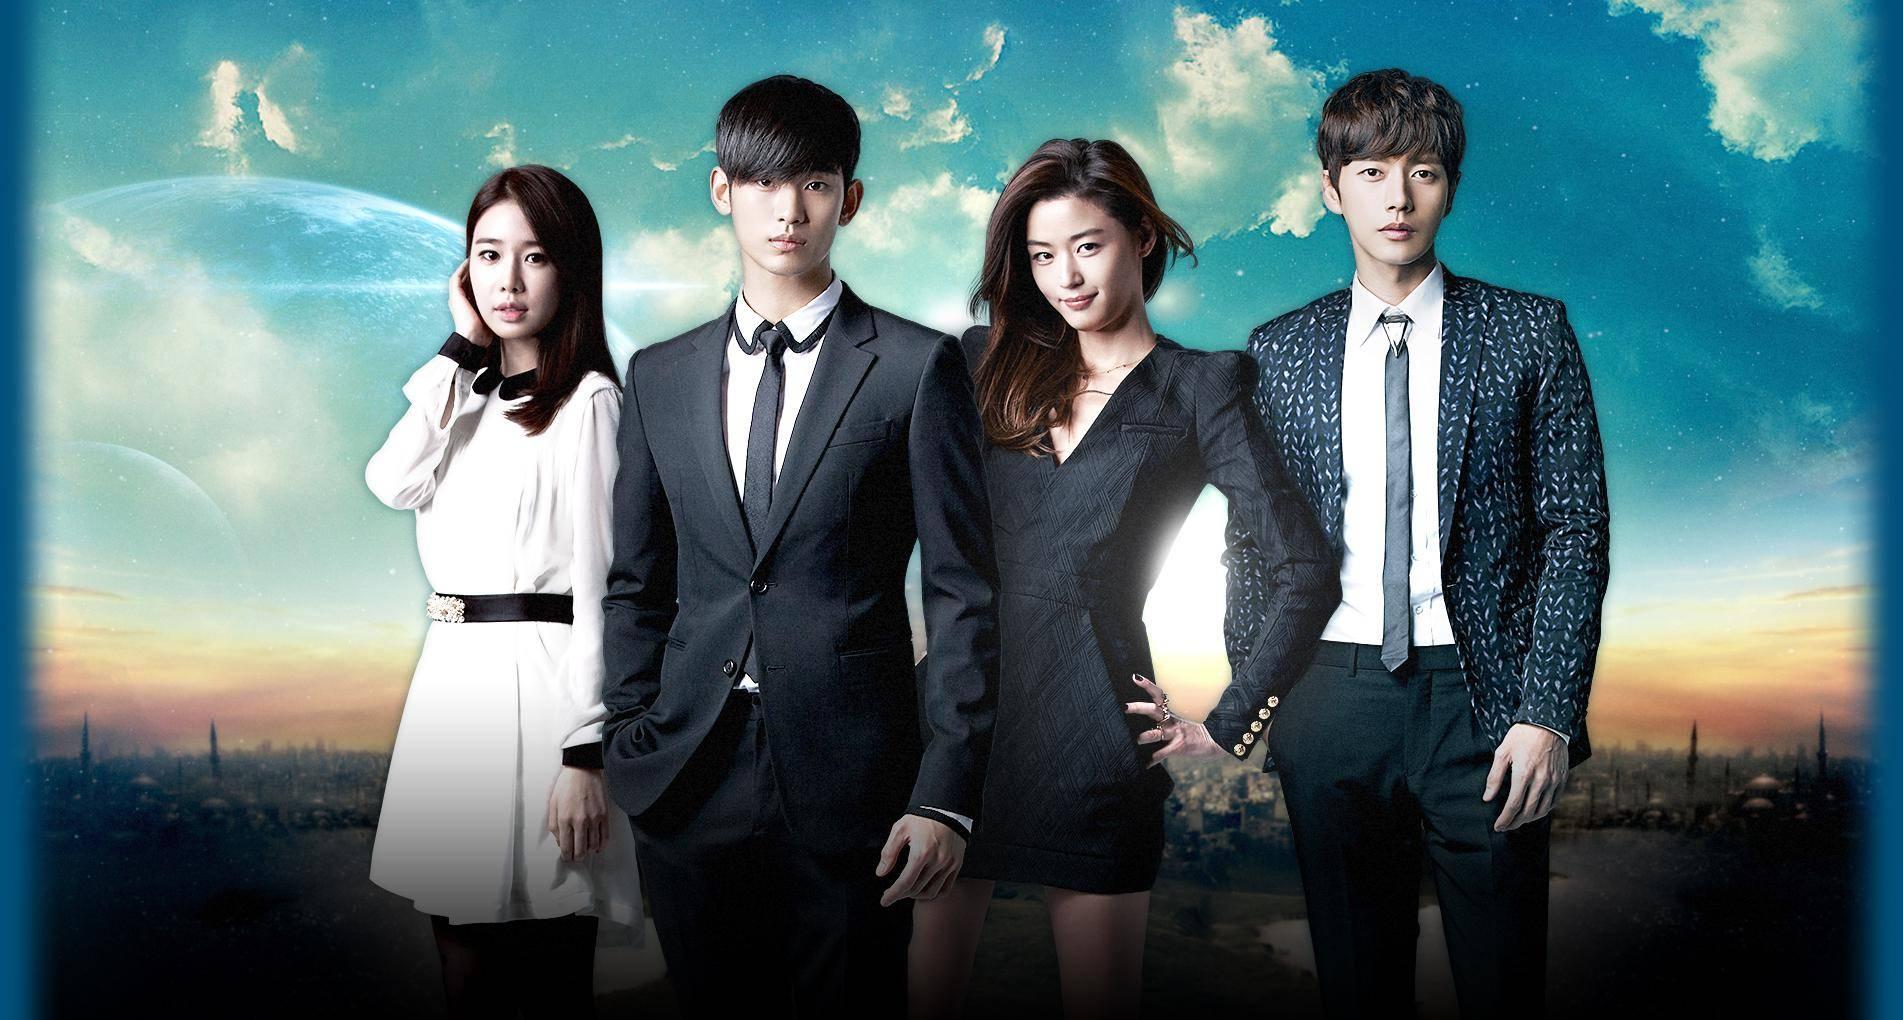 My Love from the Star Cast (Korean Drama - 2013) - 별에서 온